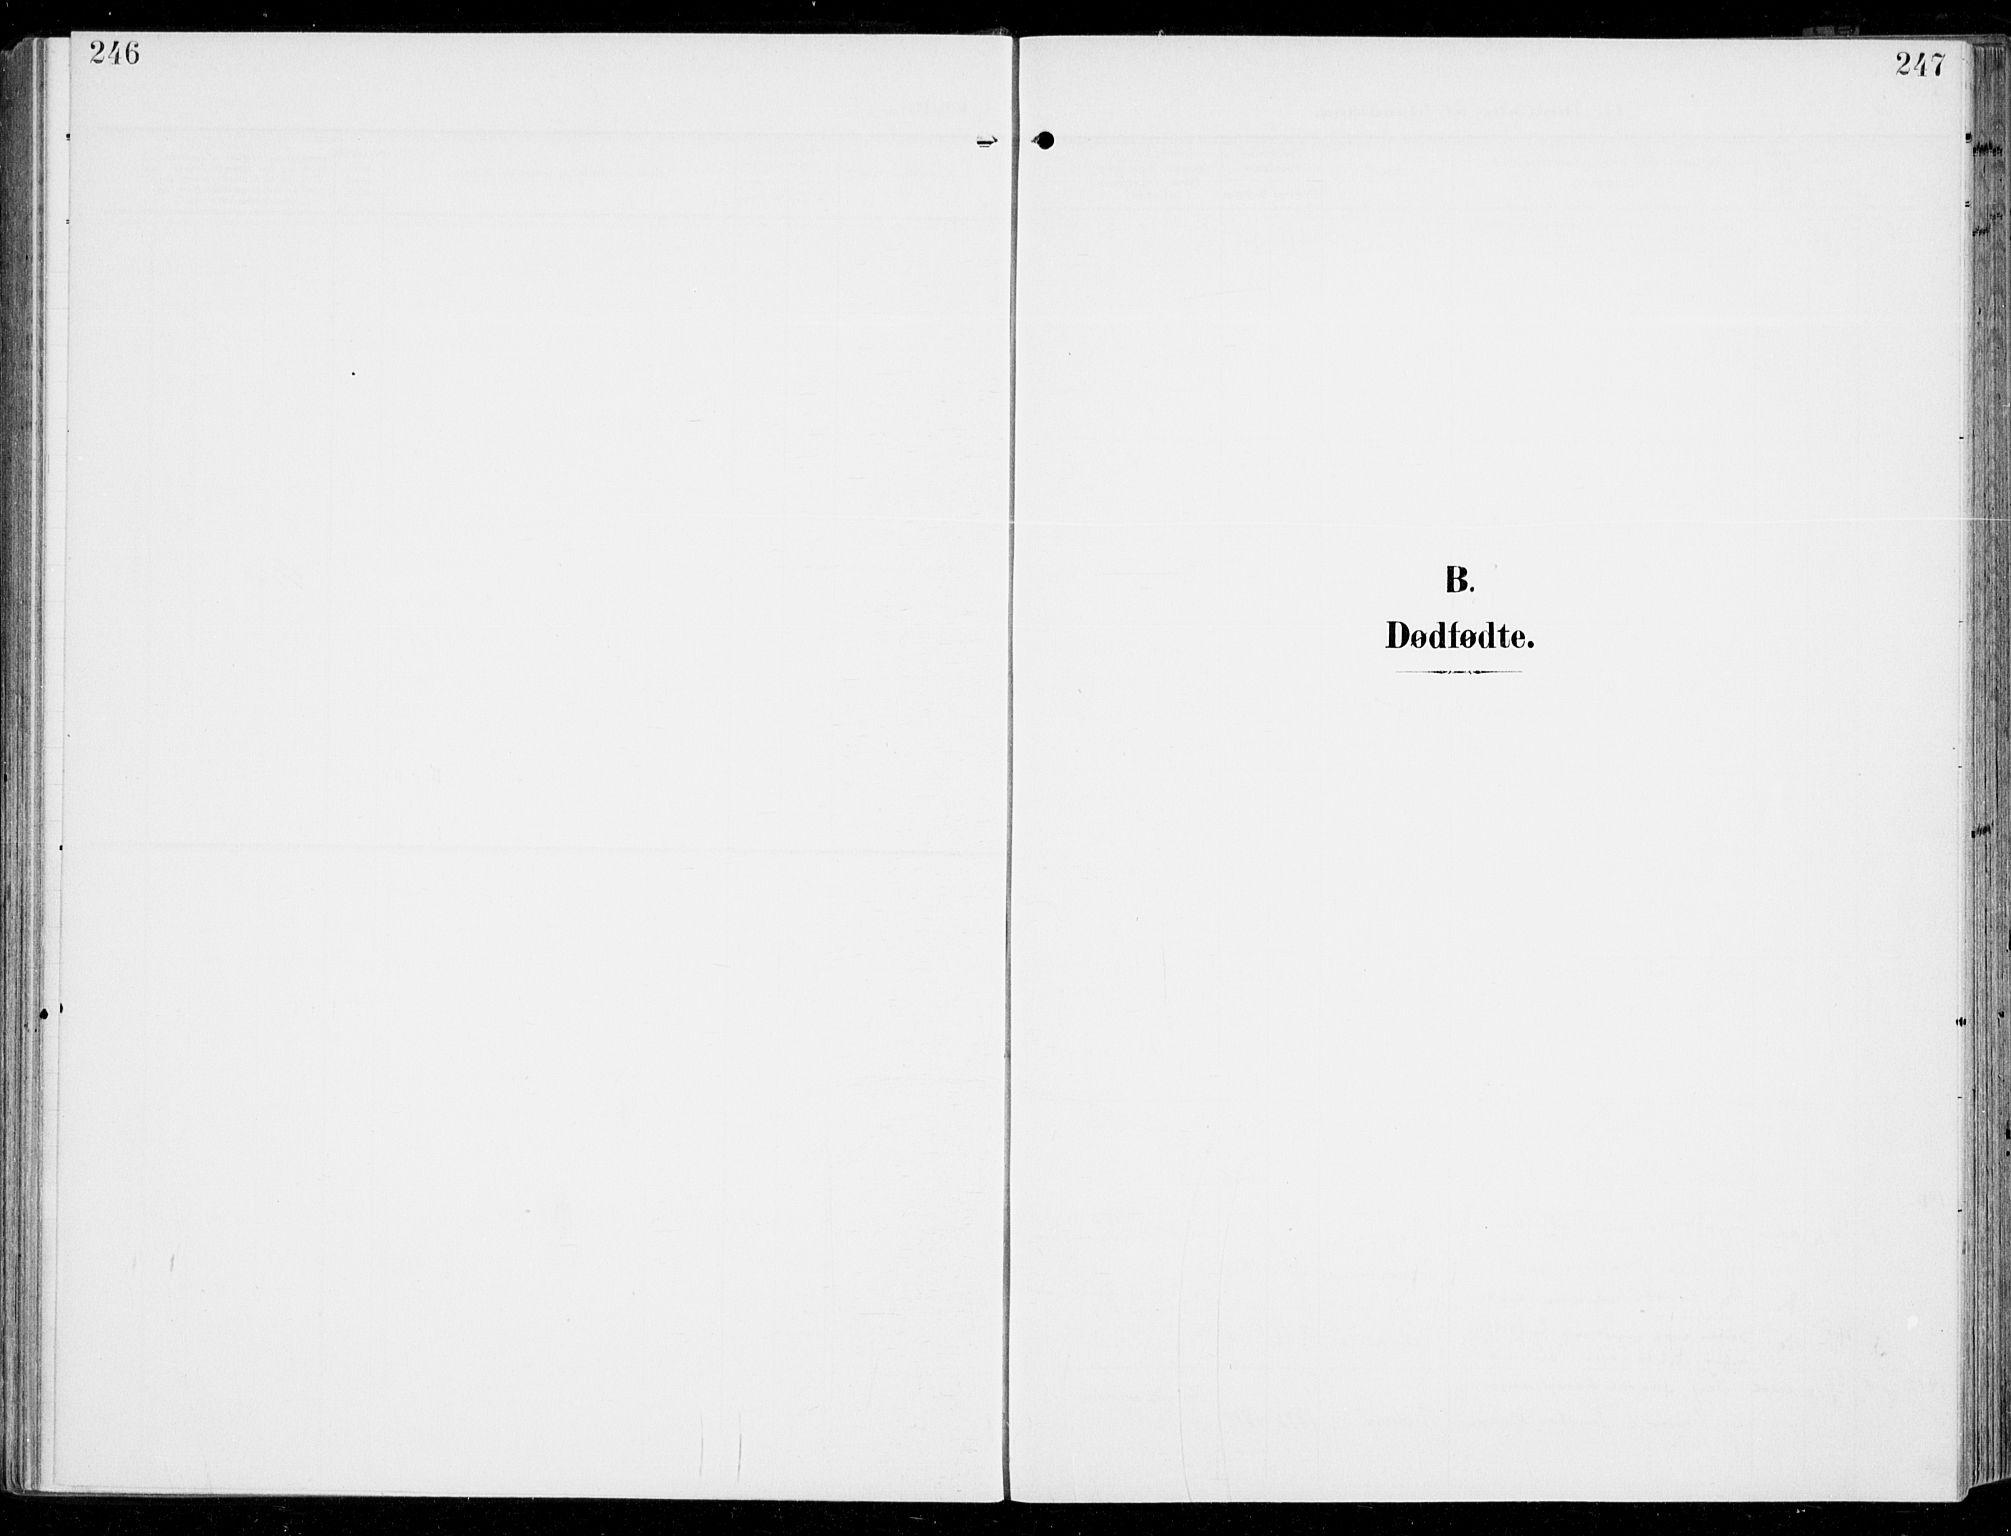 SAKO, Sem kirkebøker, F/Fb/L0006: Ministerialbok nr. II 6, 1905-1918, s. 246-247